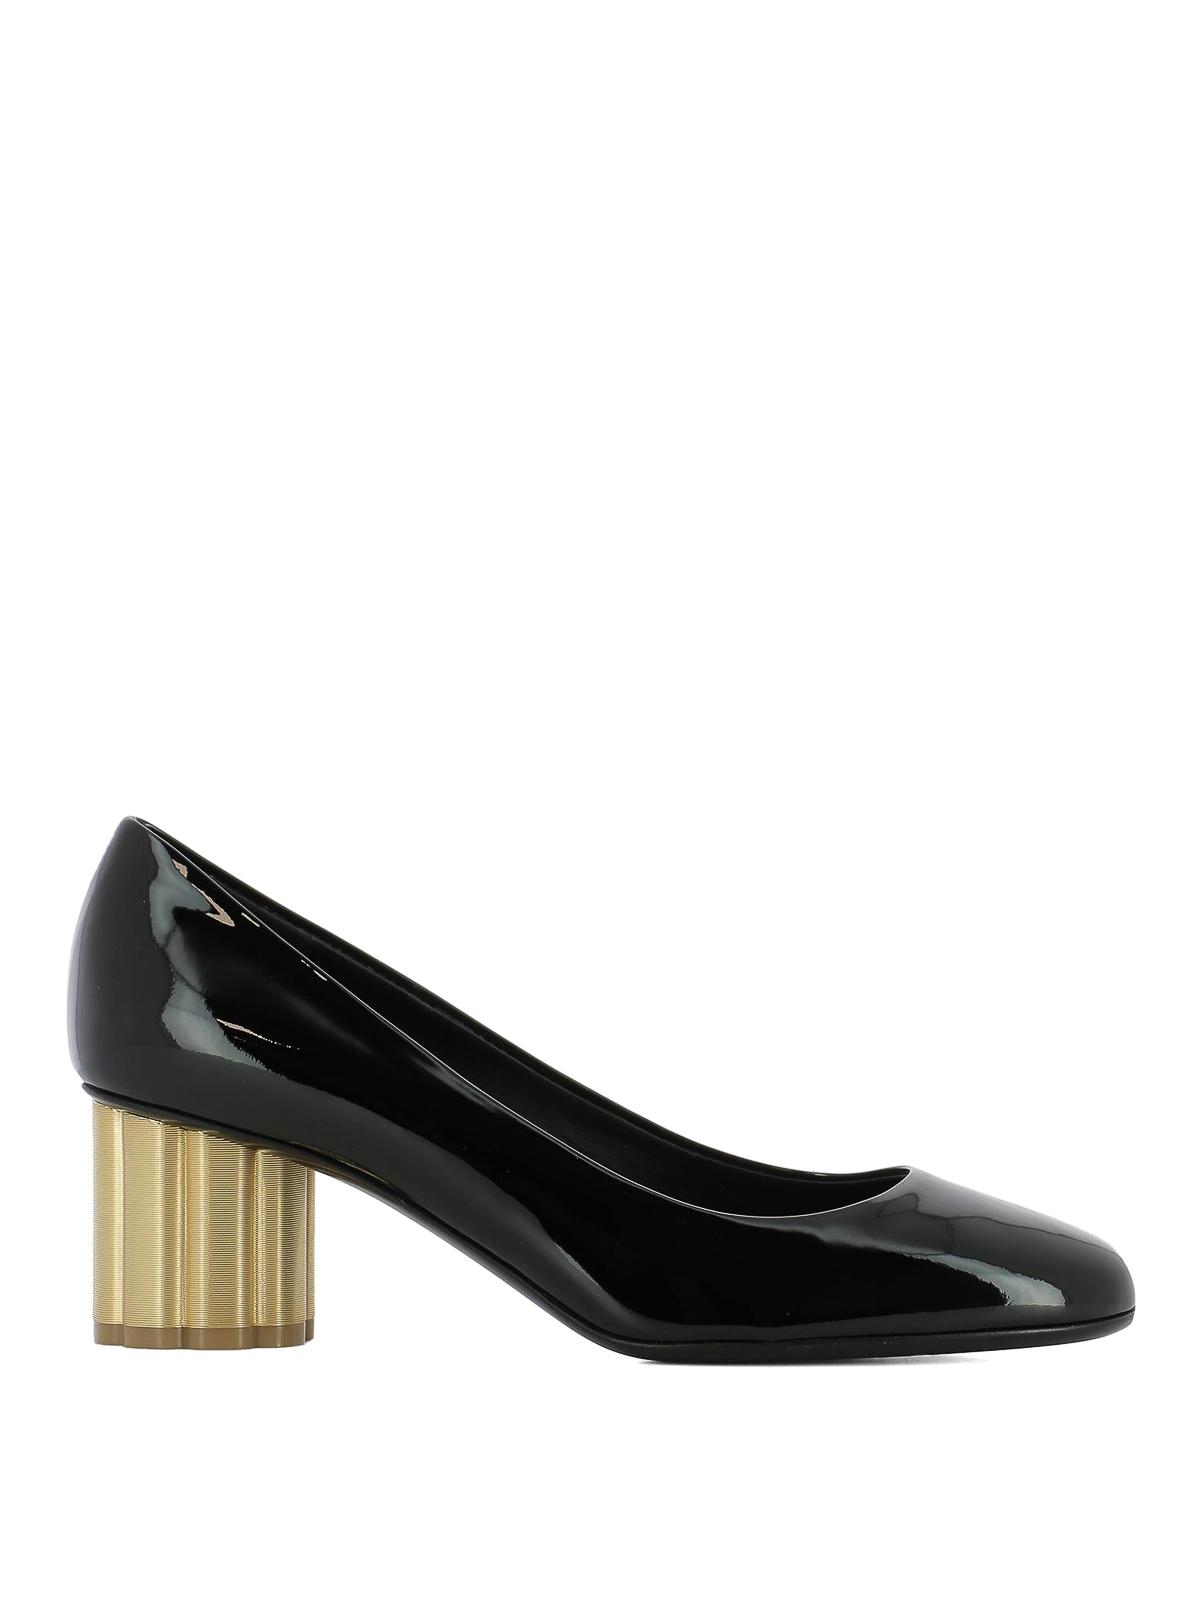 36b85755f397 Salvatore Ferragamo - Lucca 55 patent leather pumps - court shoes ...